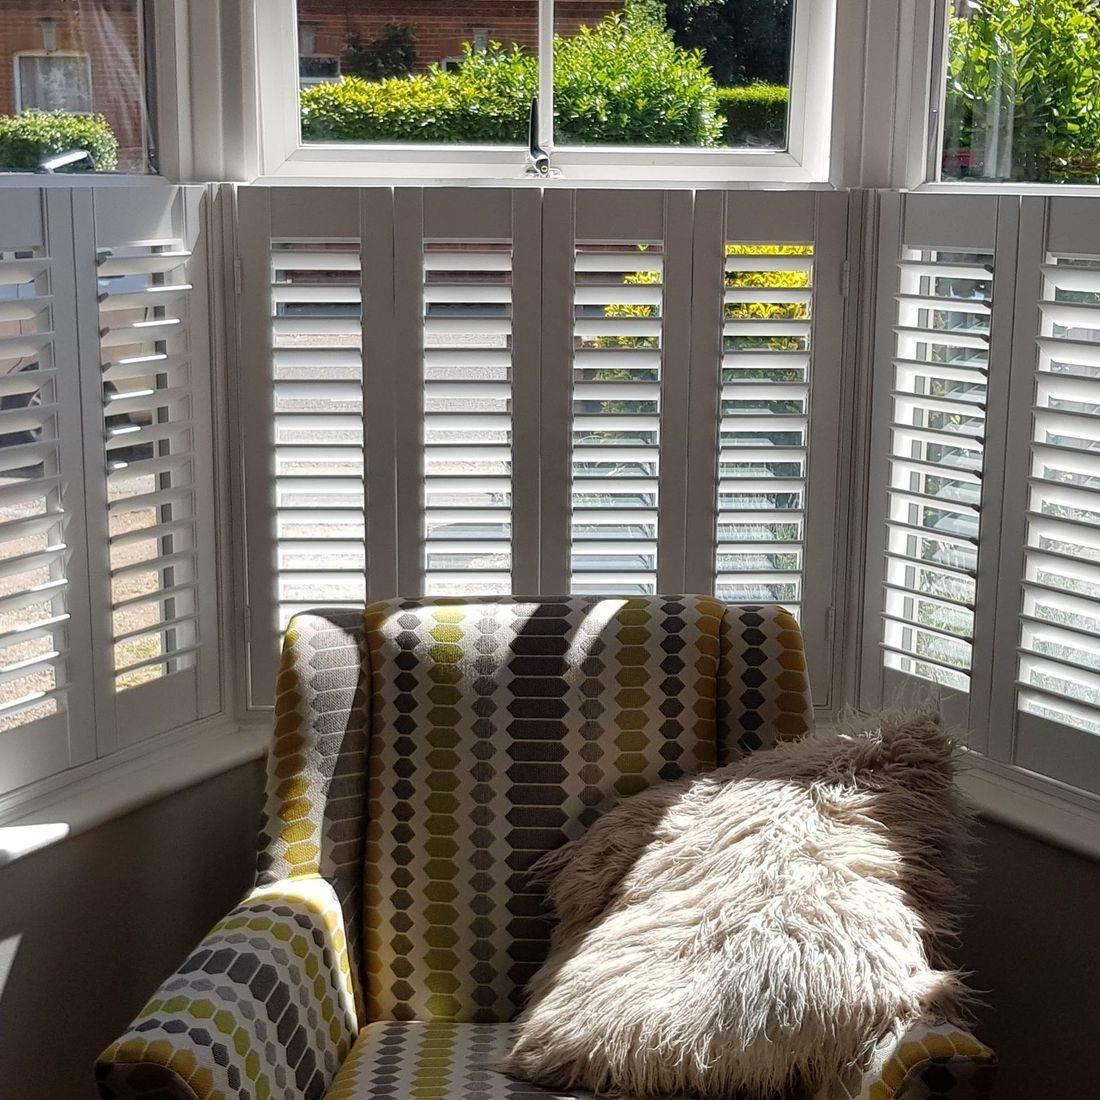 Bury blinds shutters shaped